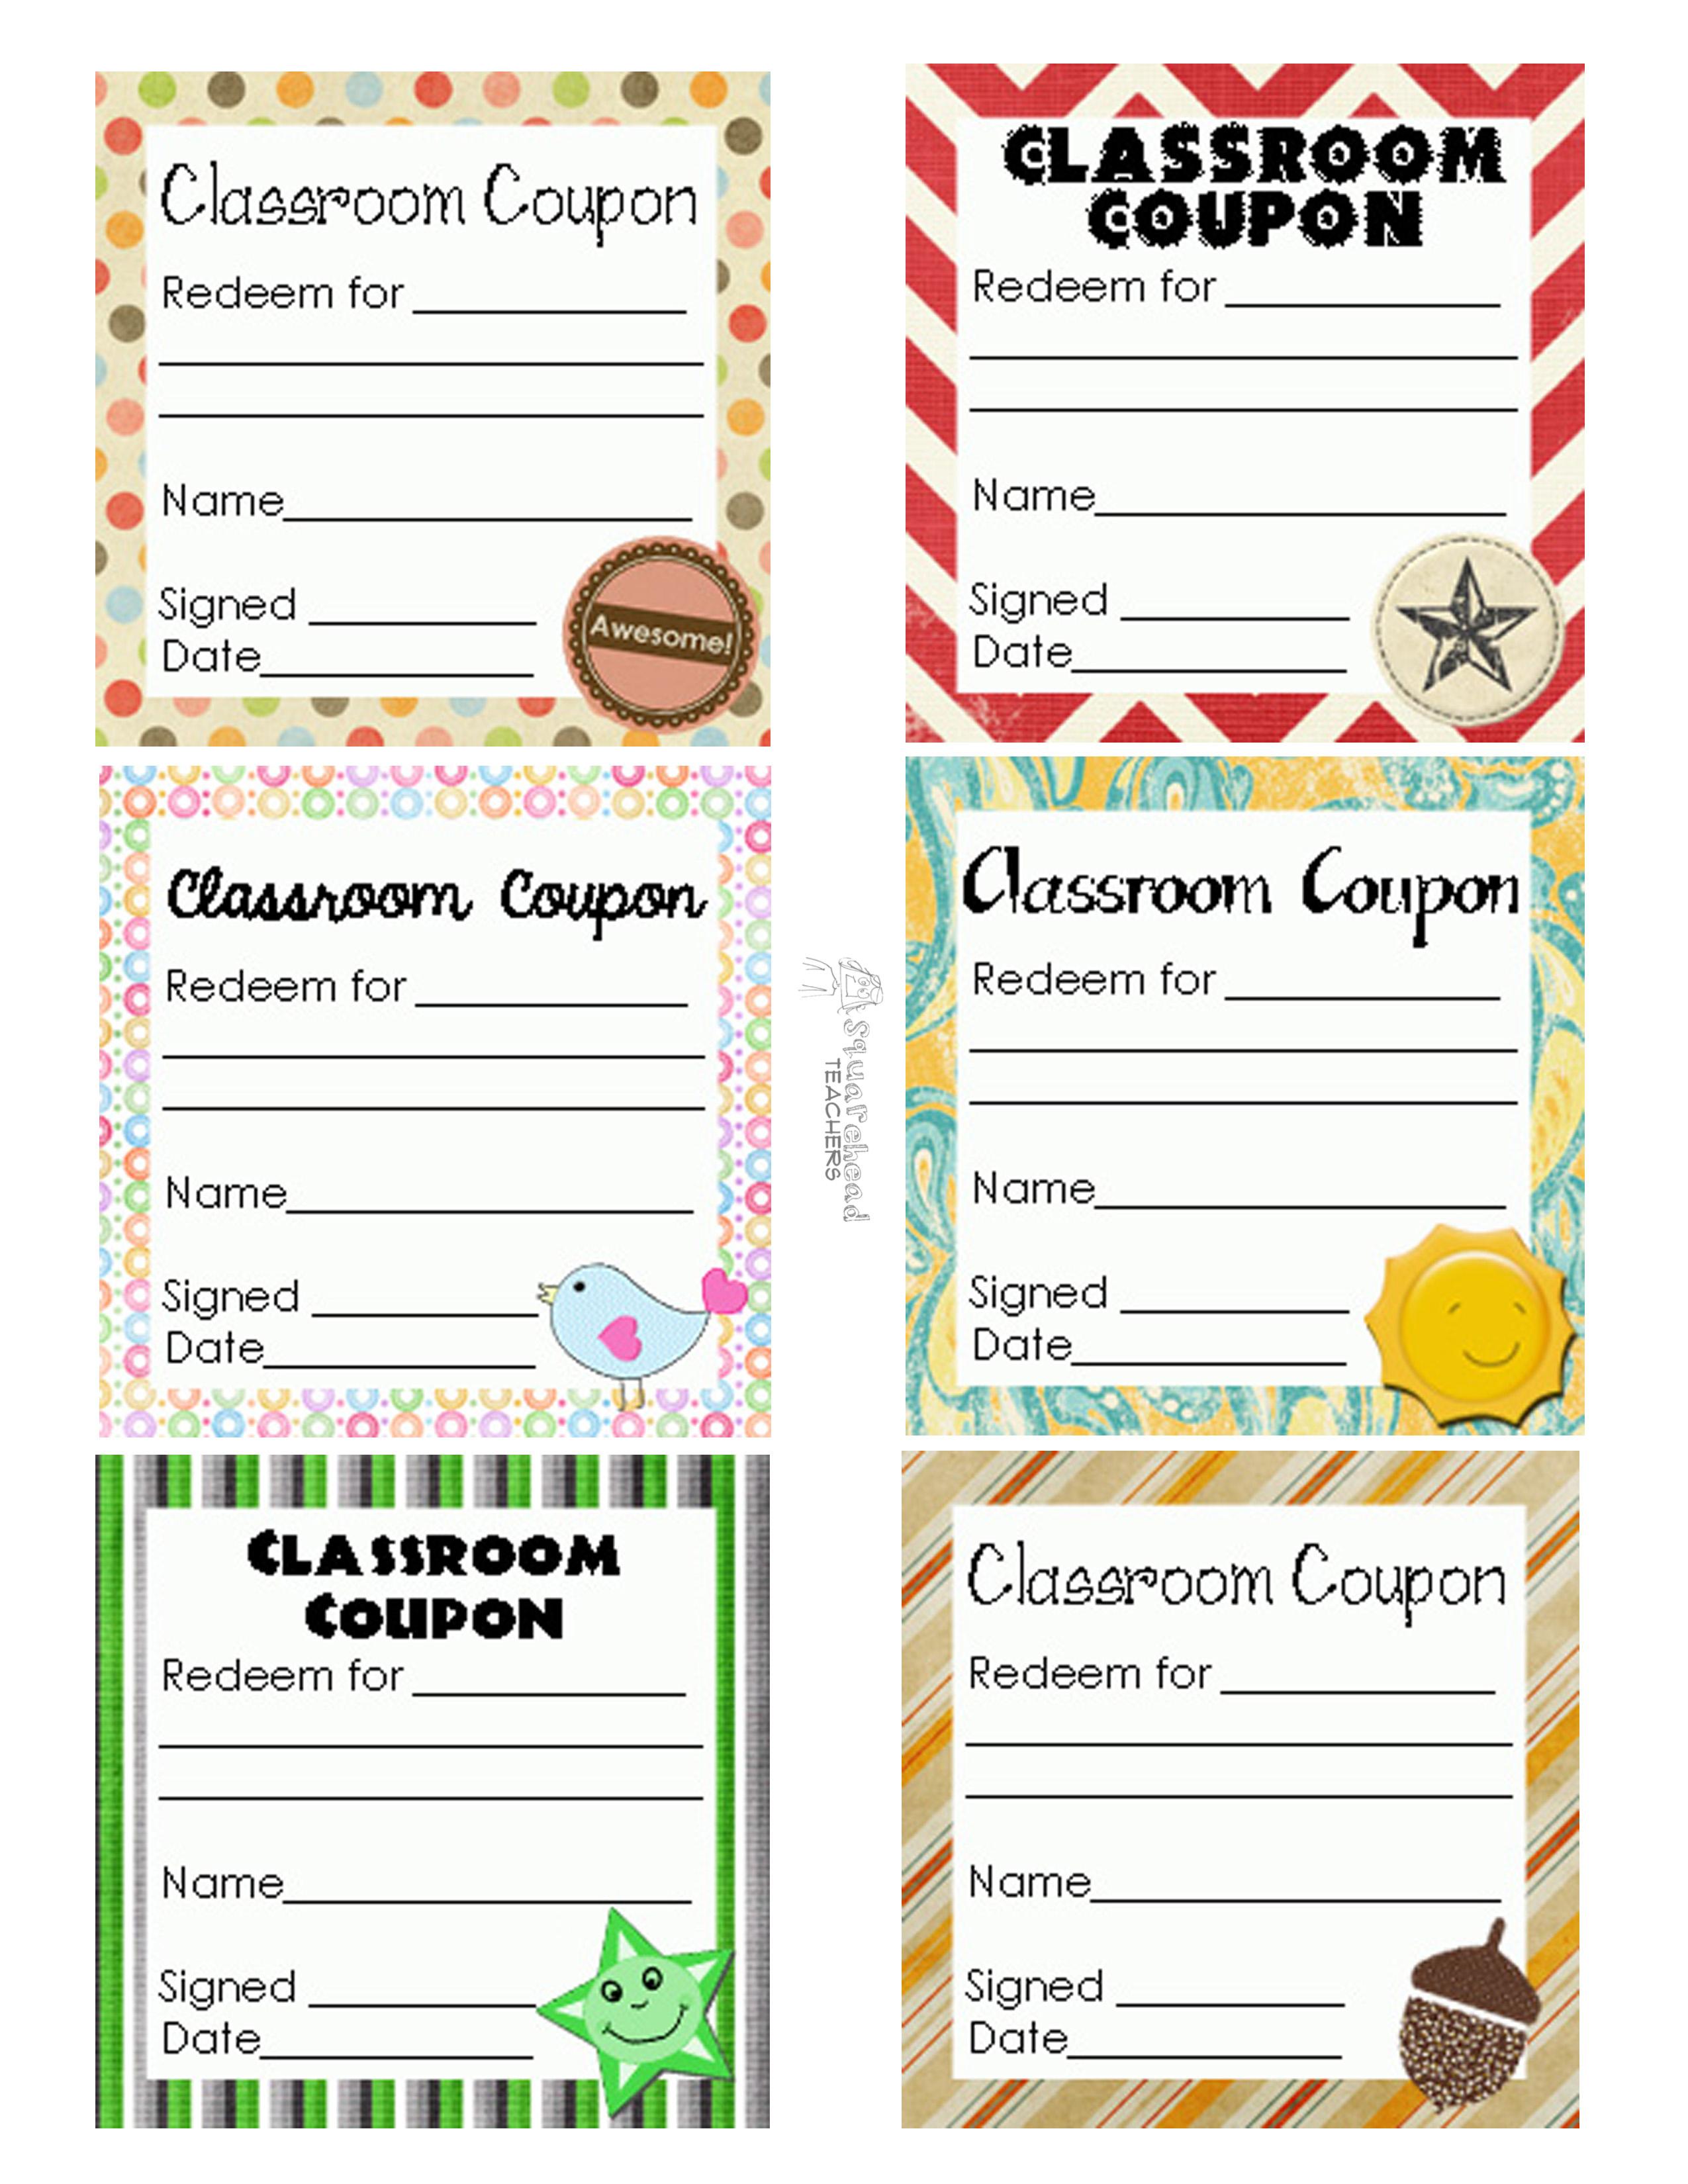 Classroom Coupons Updated | Squarehead Teachers - Free Printable Homework Pass Coupon